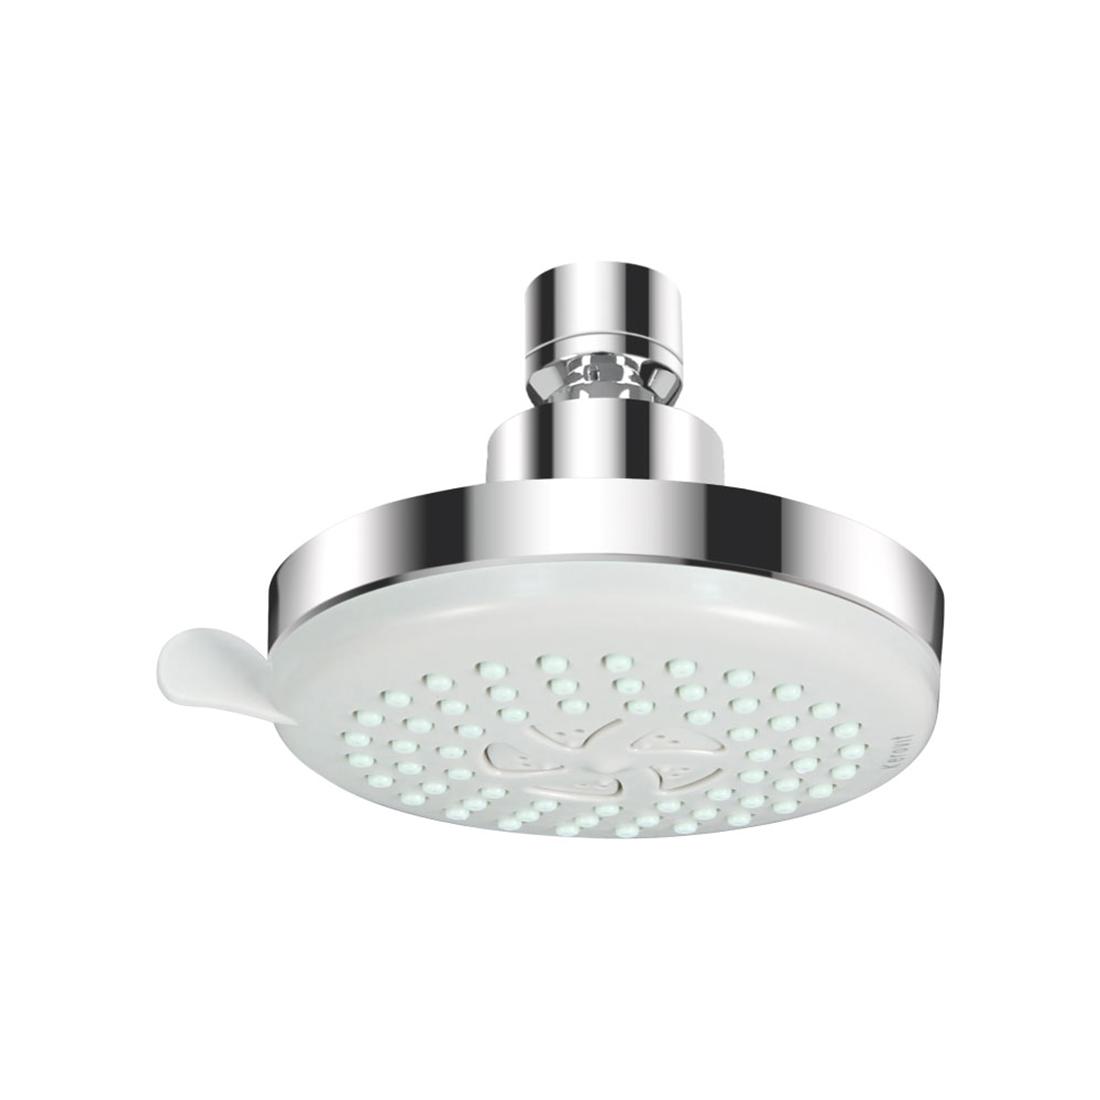 Kerovit KA560002 Three Function Overhead Shower